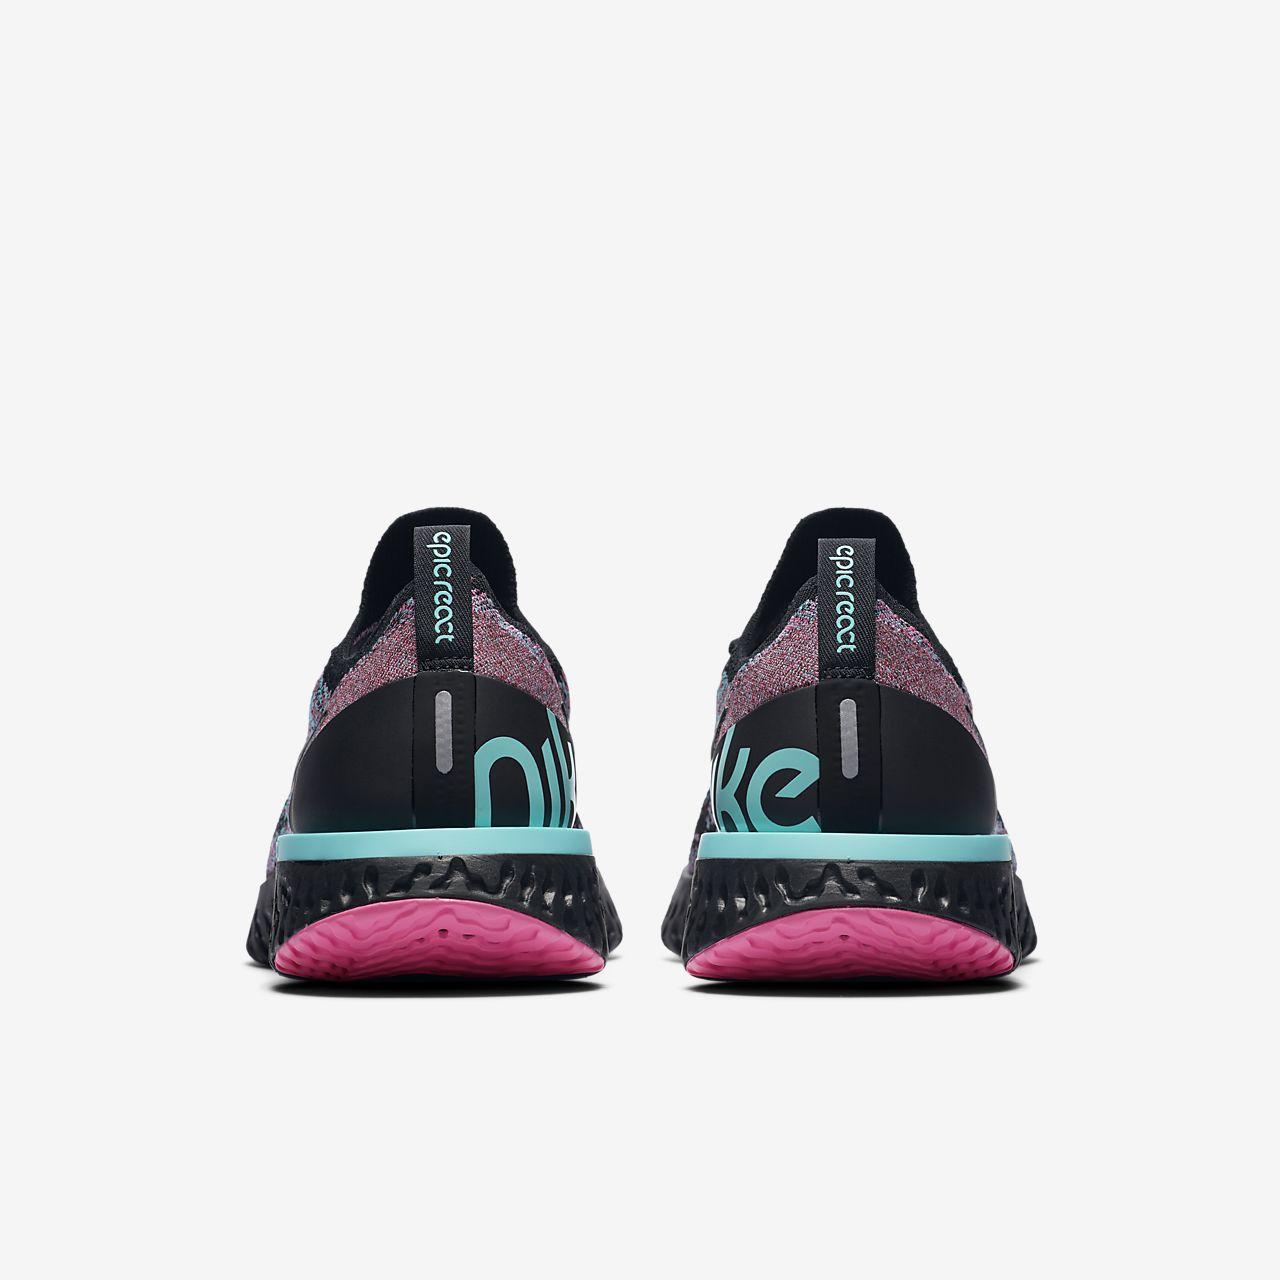 0a56081af4d1 Nike Epic React Flyknit 1 Men s Running Shoe. Nike.com